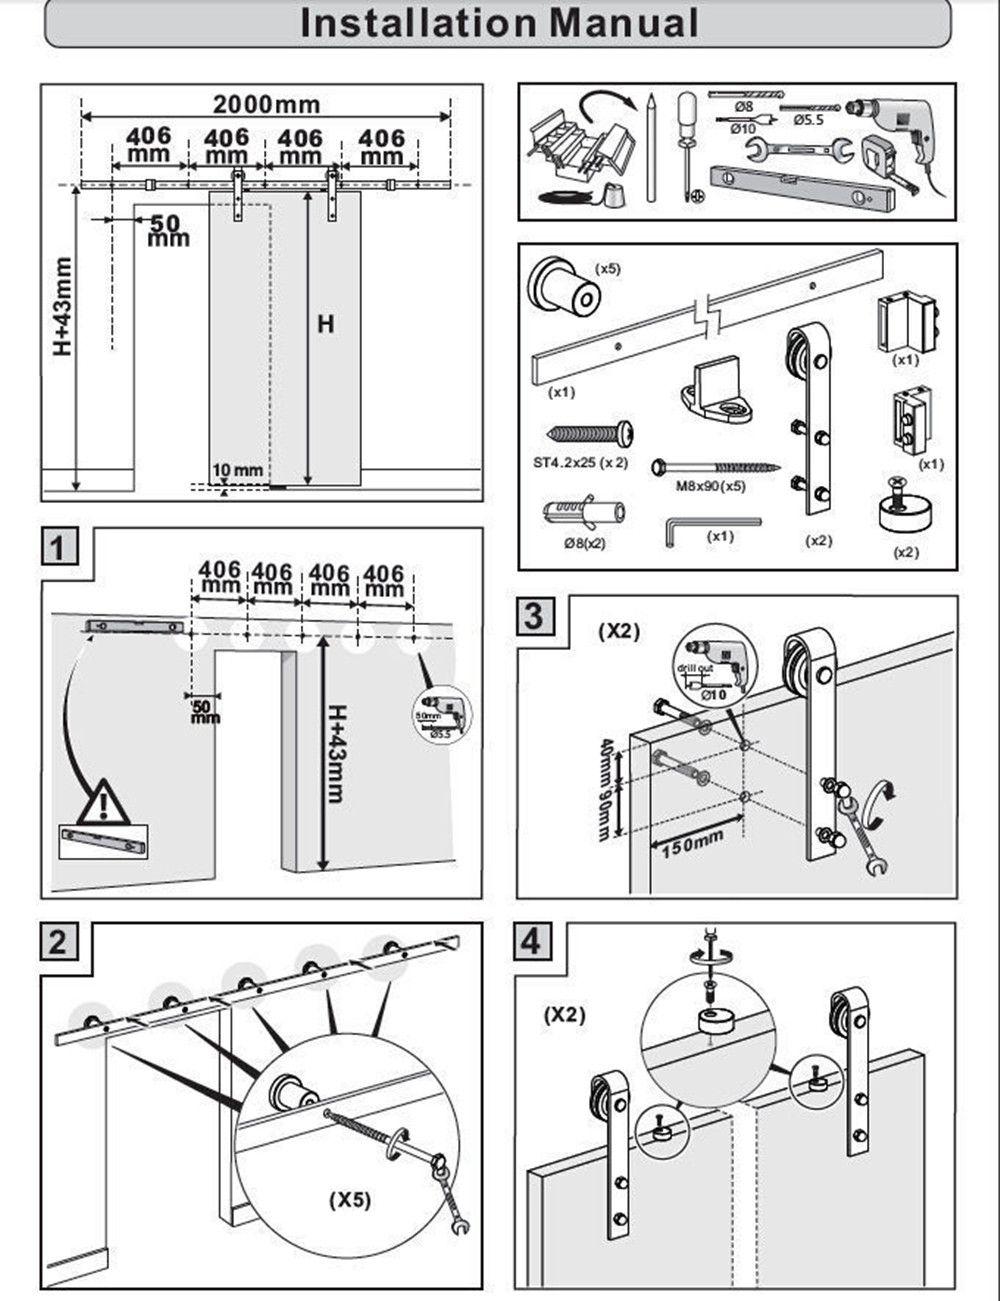 how to put a screen door handle together